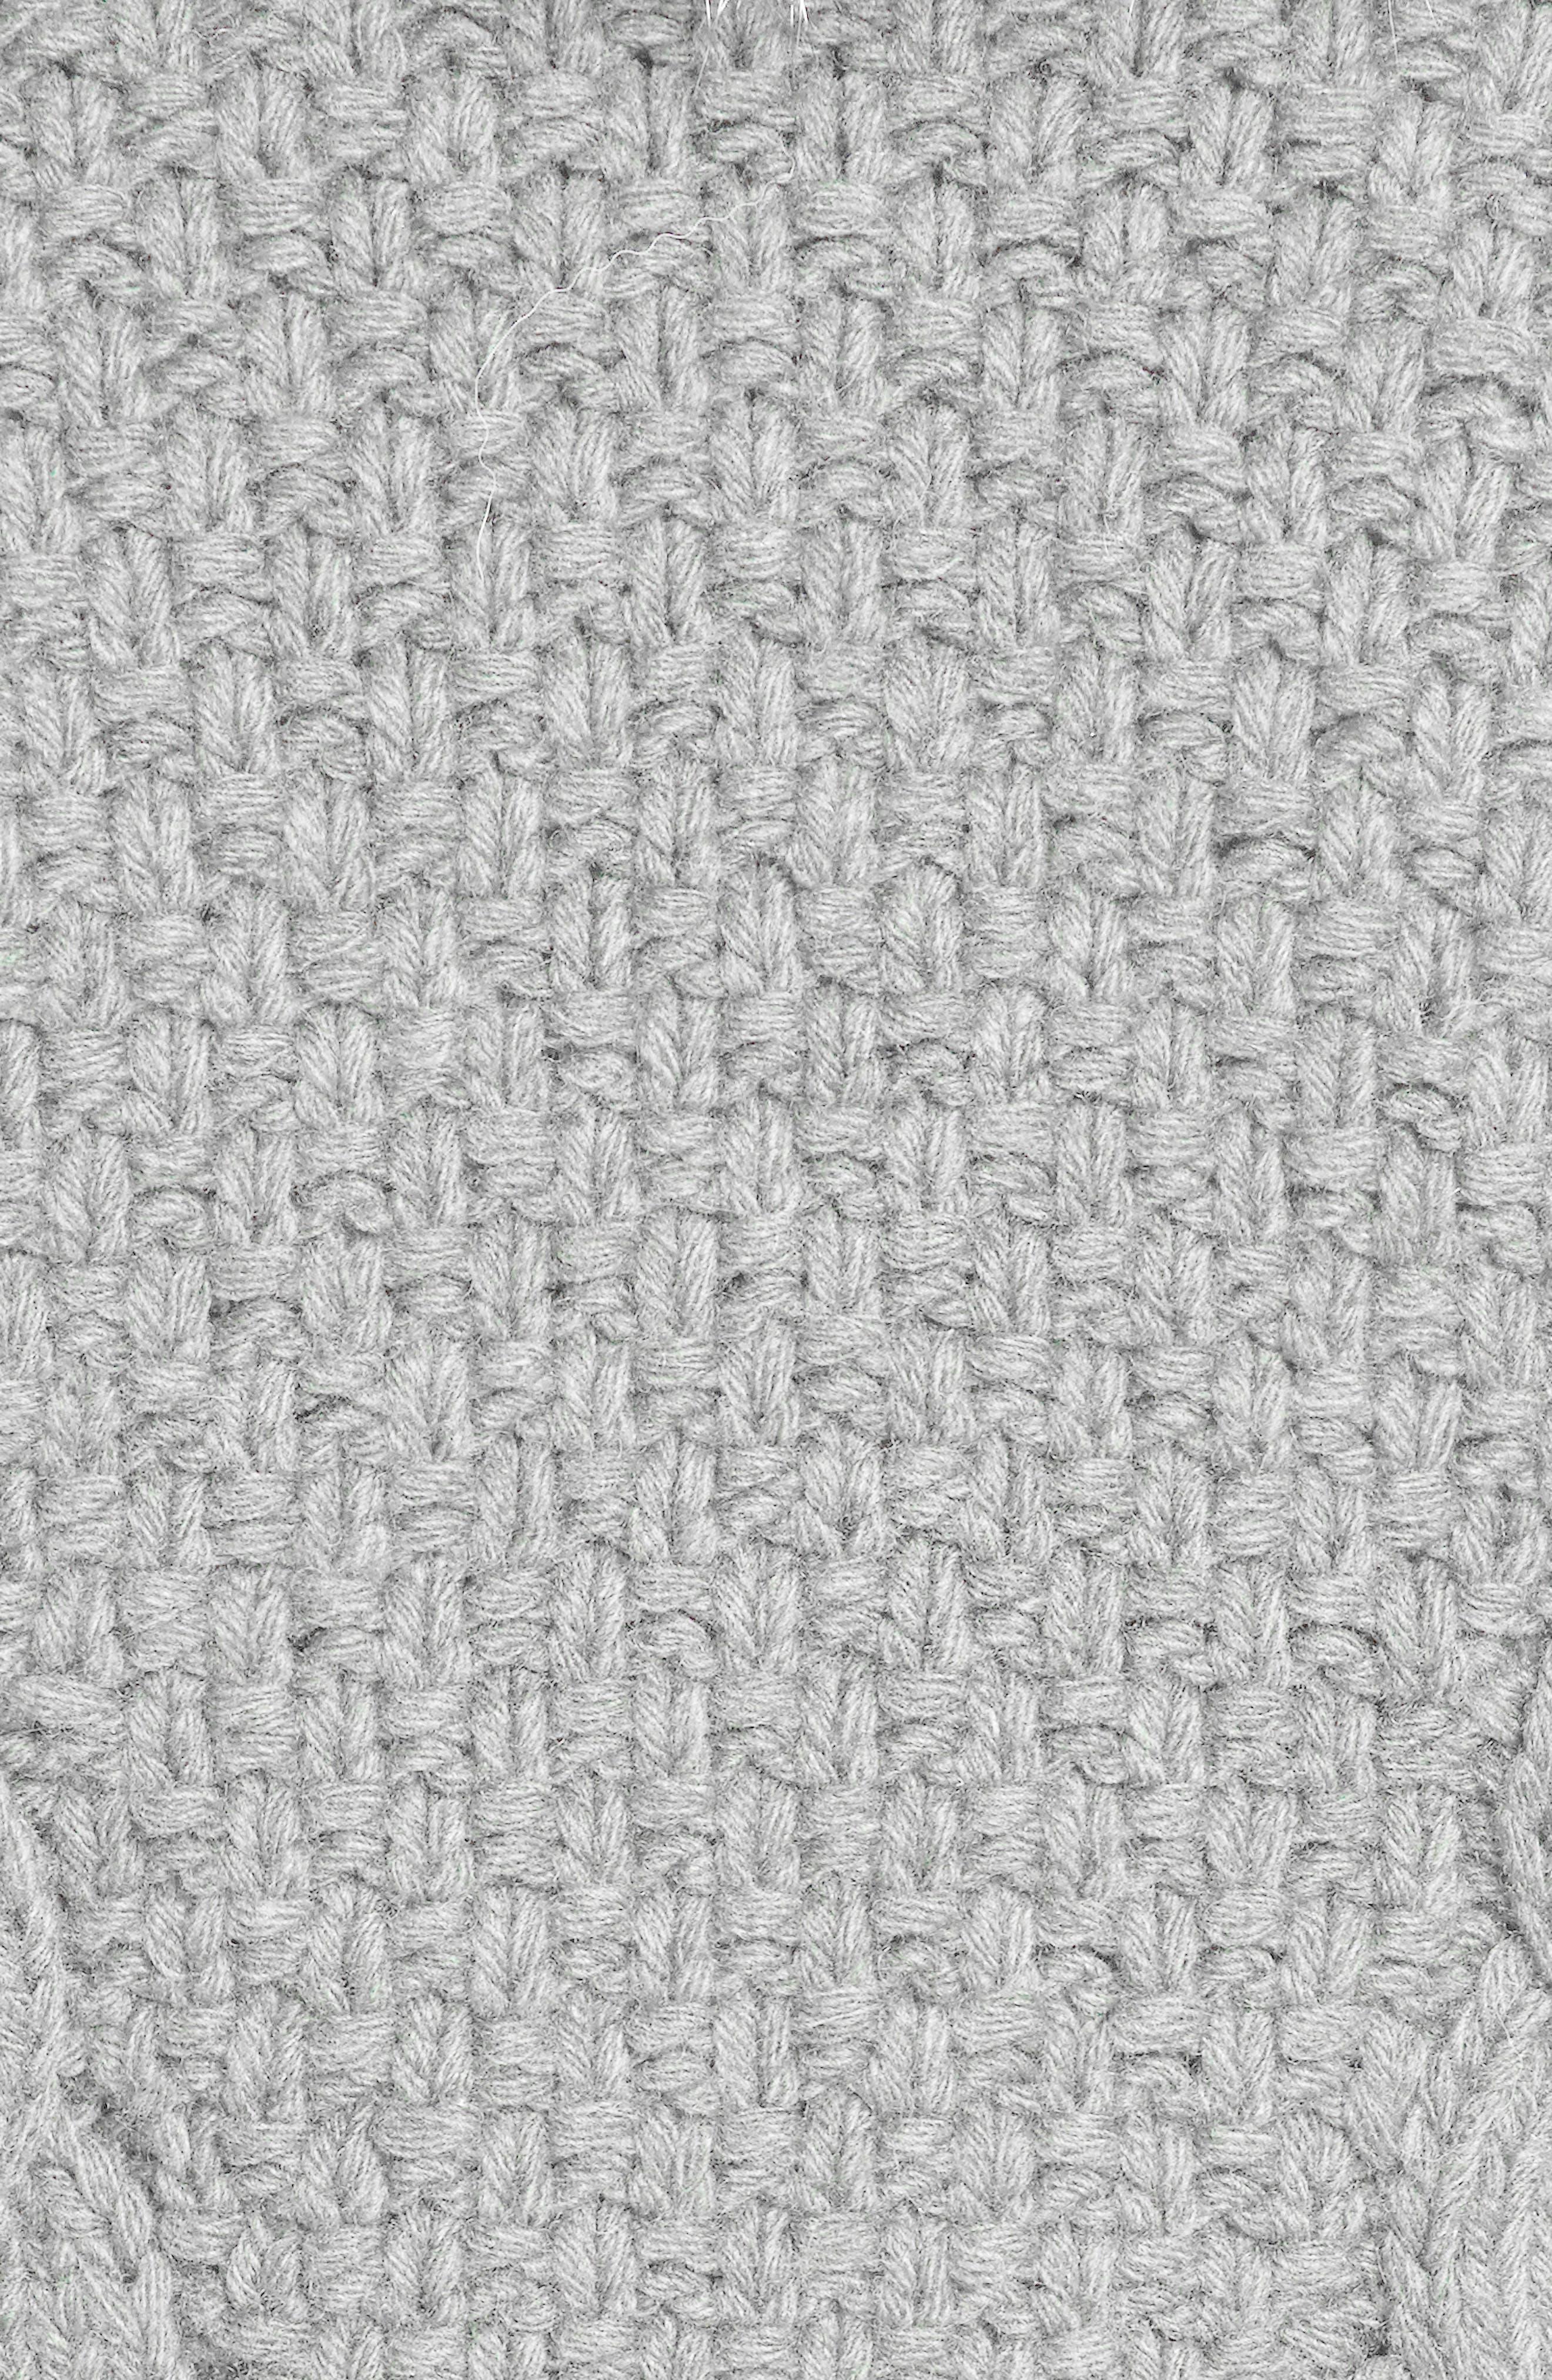 Merino Wool & Cashmere Knit Bolero with Removable Genuine Fox Fur Collar,                             Alternate thumbnail 4, color,                             Grey